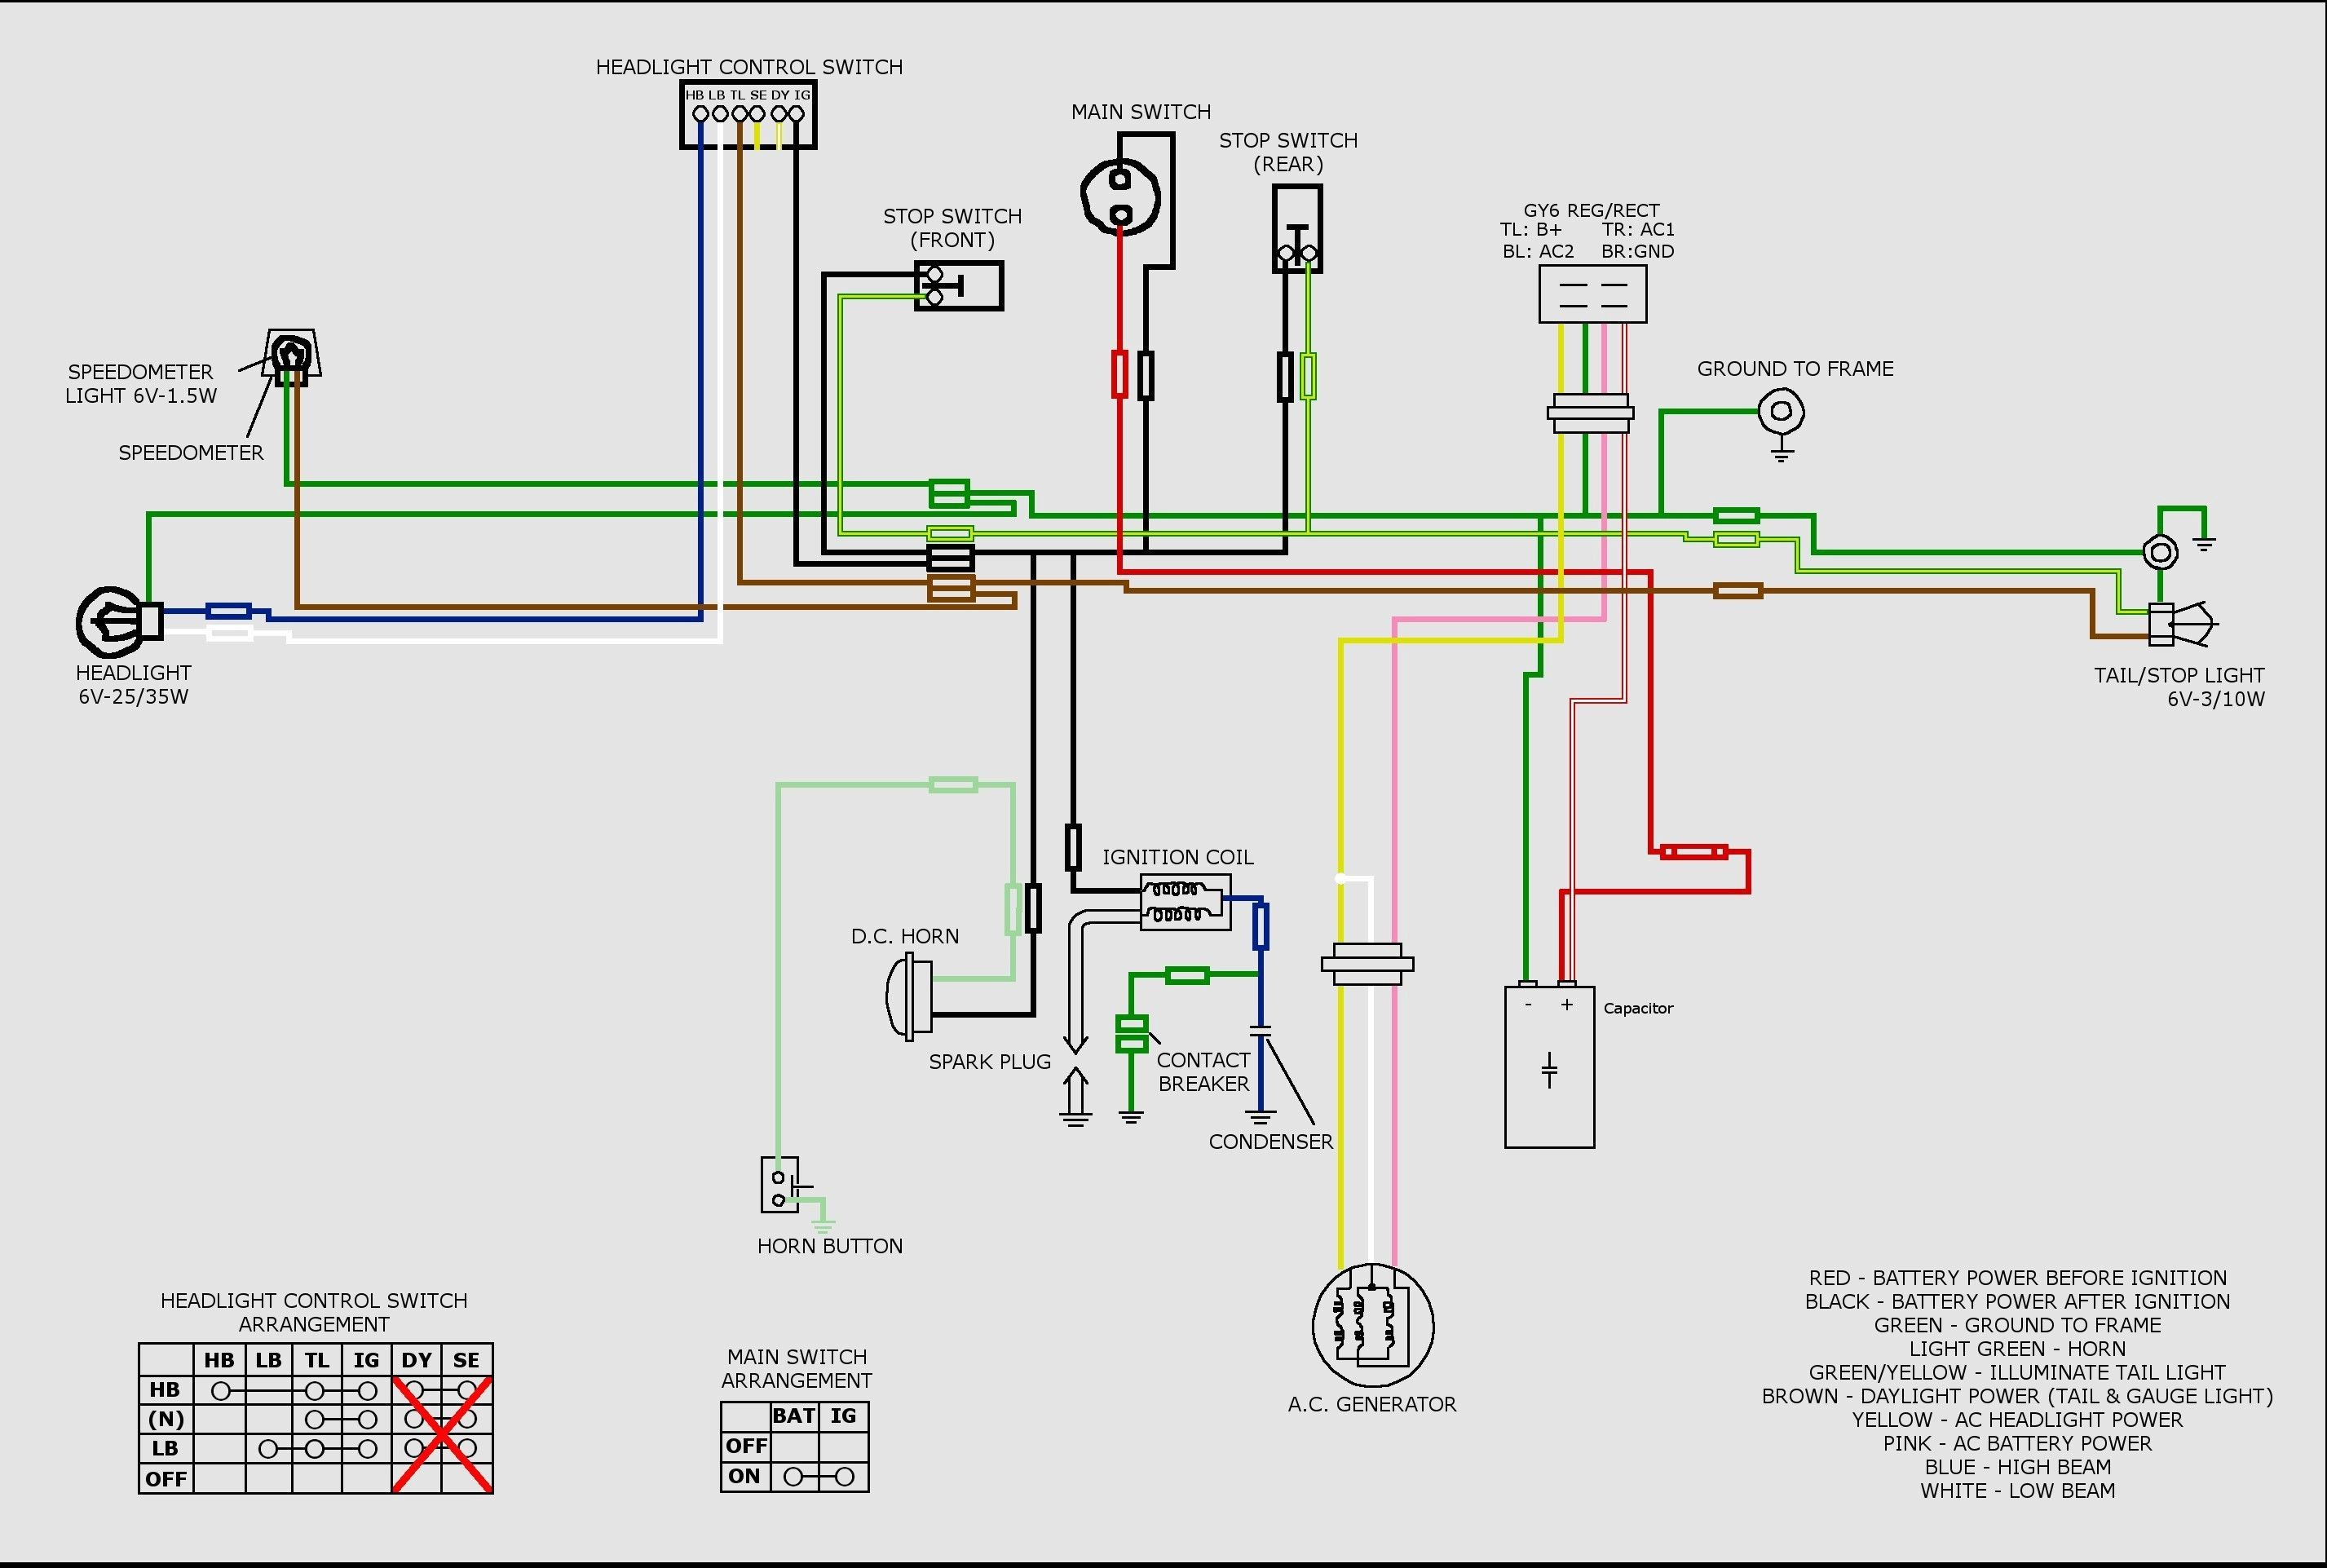 Tao Tao 110 Wiring Diagram Gy6 Wiring Diagram Awesome 150cc Gy6 Wiring Diagram within Of Tao Tao 110 Wiring Diagram